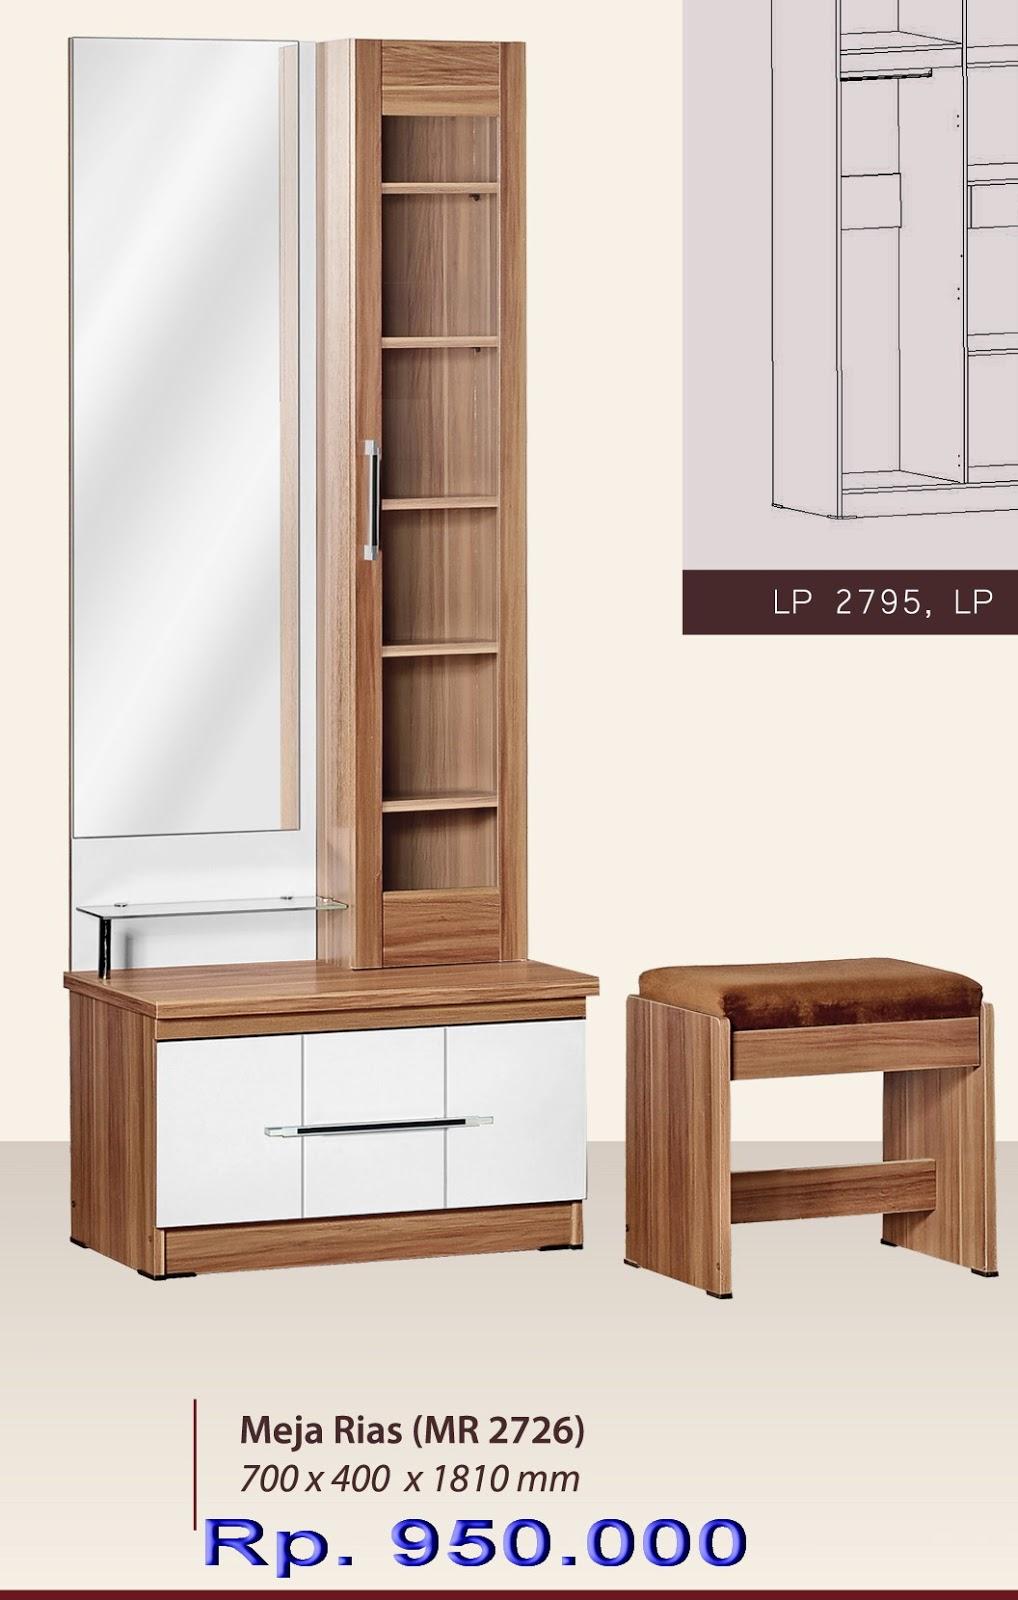 Furniture Rumah Online Meja Rias Minimalis Bougenville